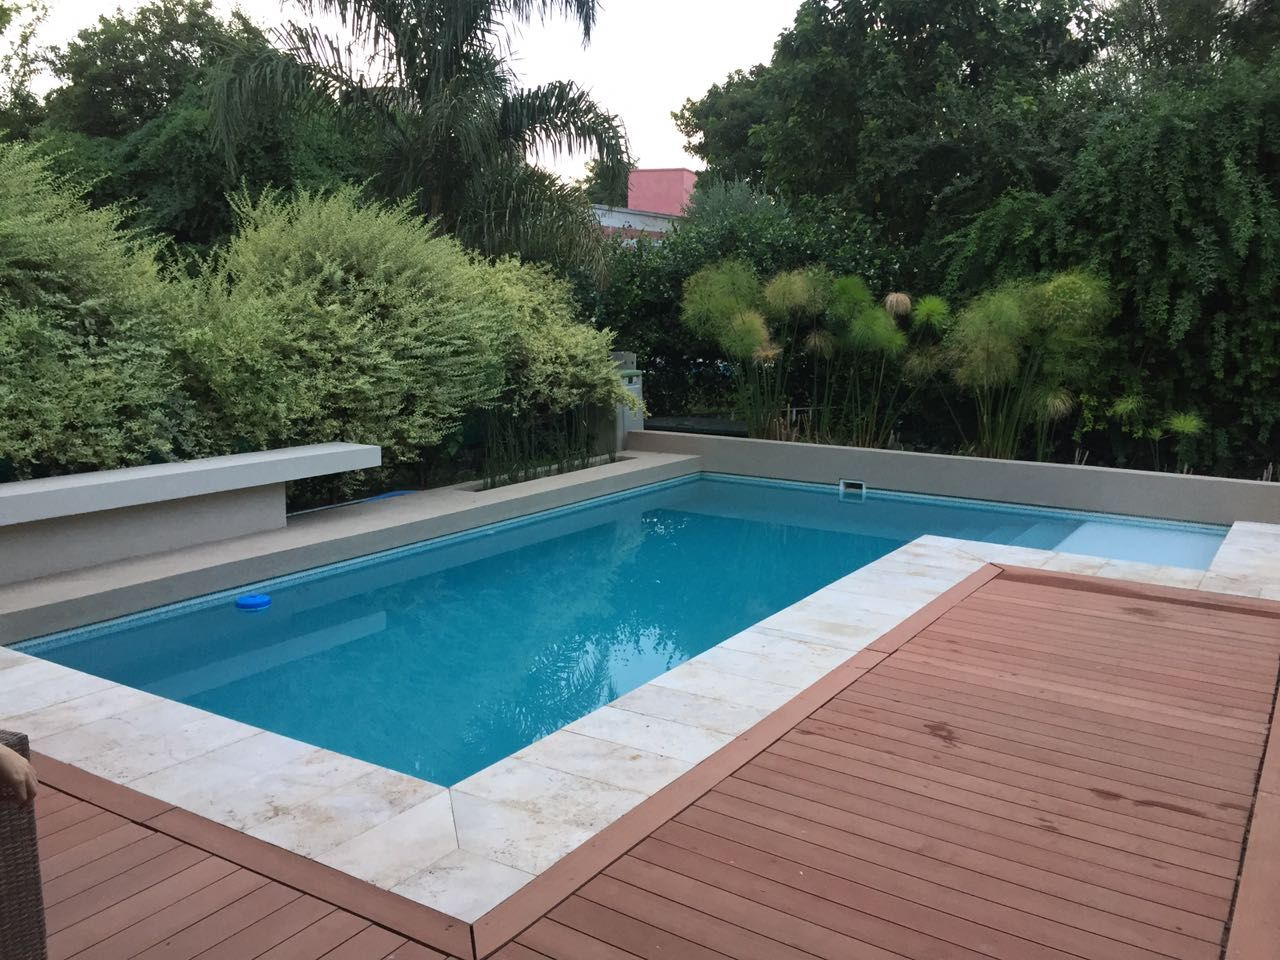 free piscinas diseo wellnes cantero solado travertino with piscinas con diseo - Piscinas De Diseo